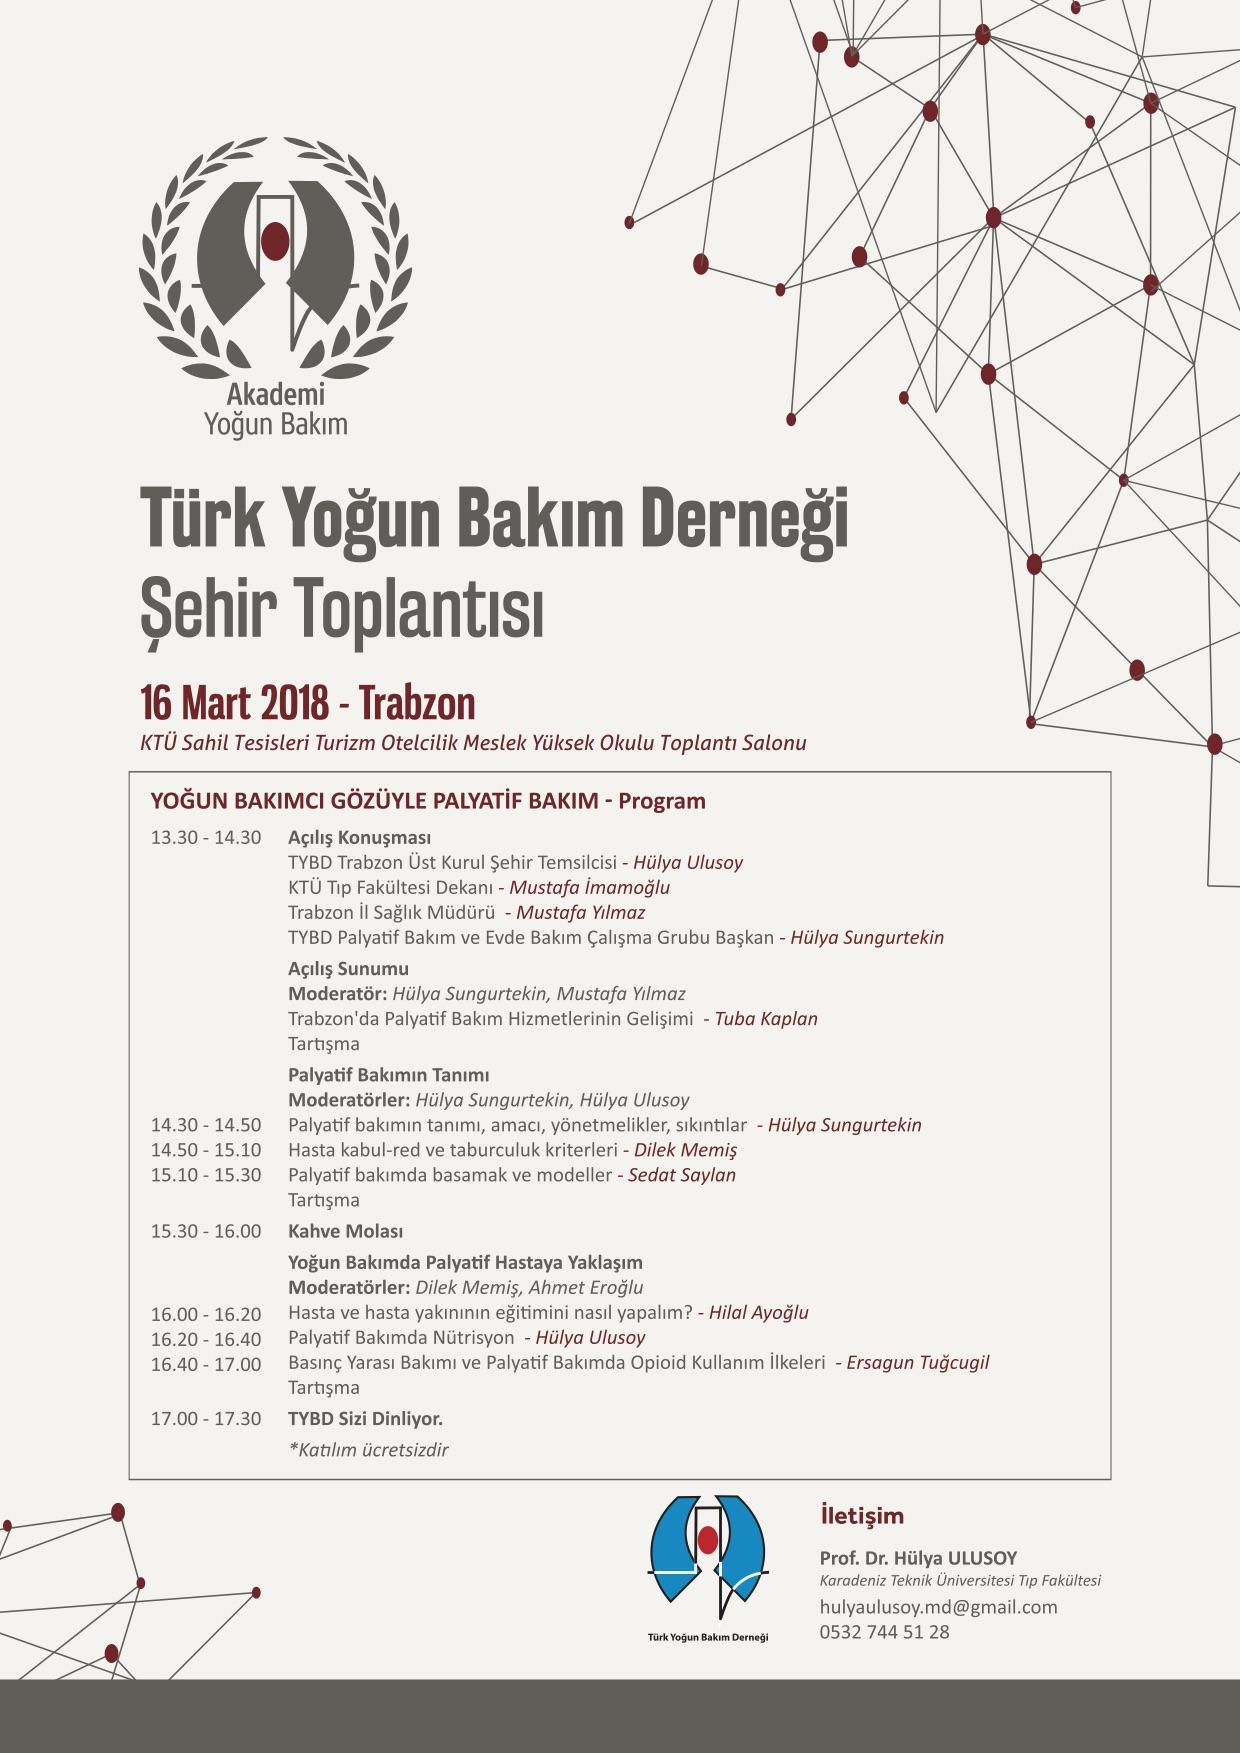 Þehir Toplantýsý Trabzon